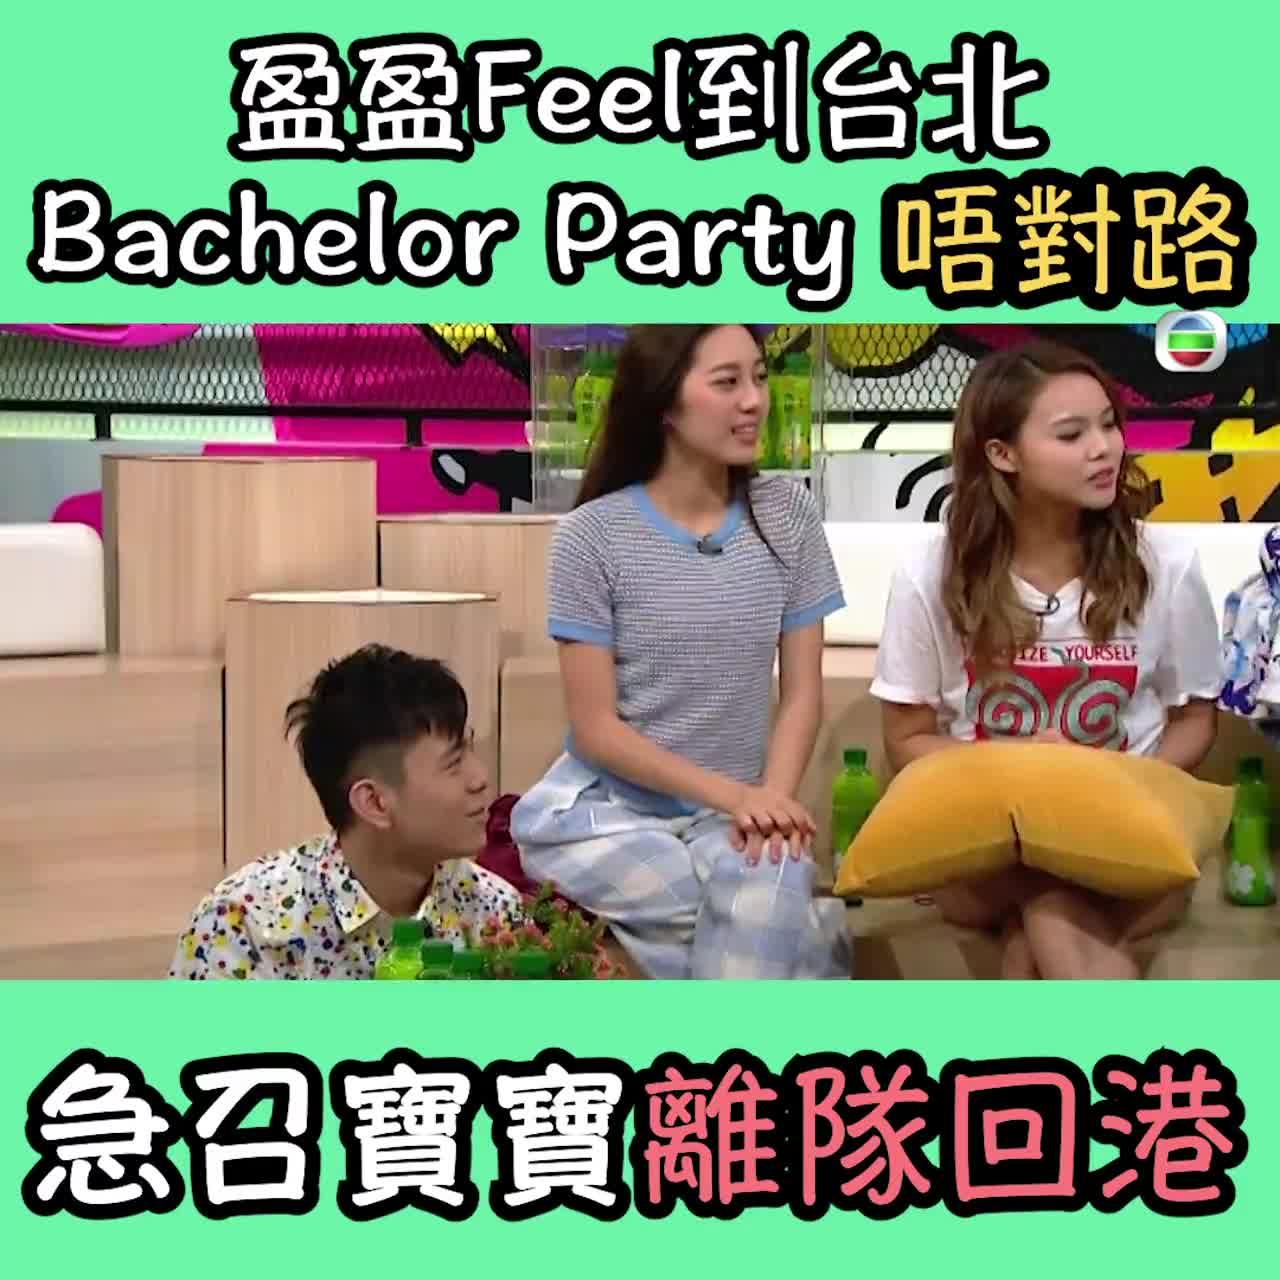 Feel到台北Bachelor Party唔對路 盈盈急召寶寶返港!